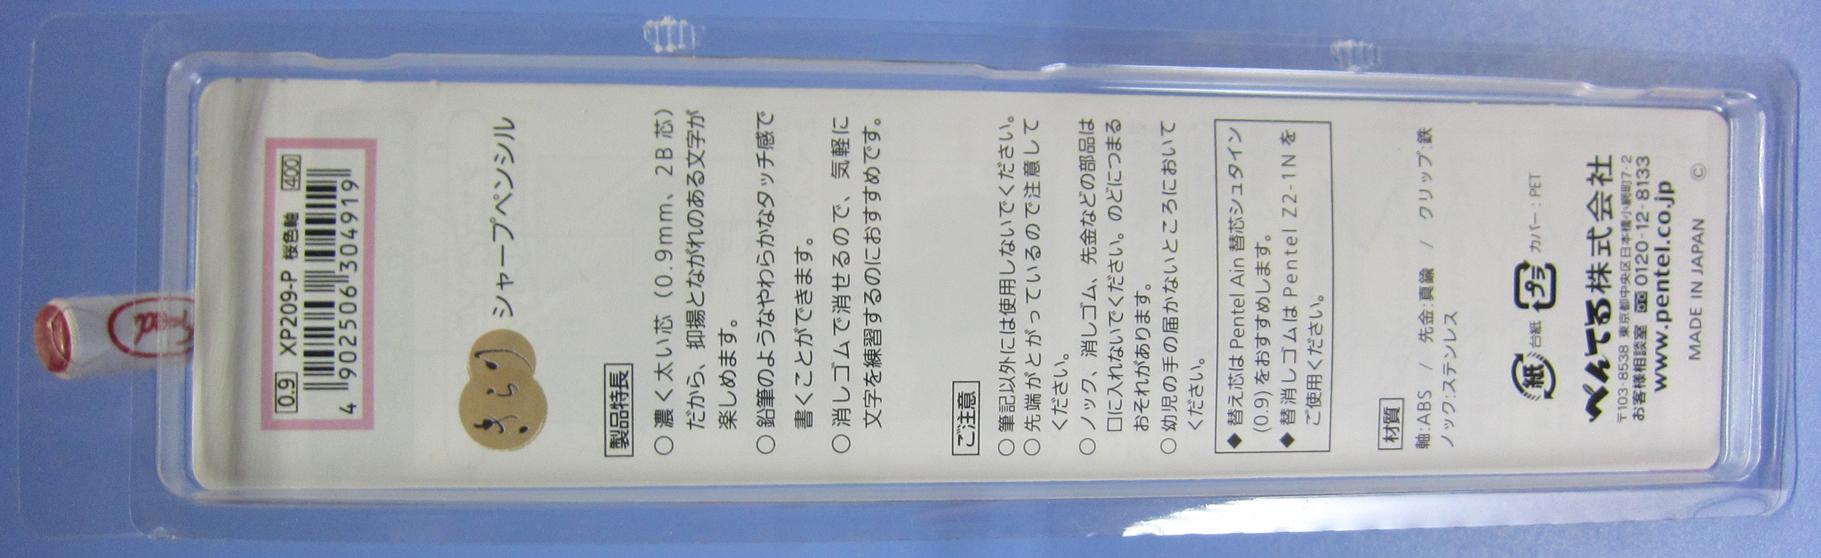 XP209-P Rear